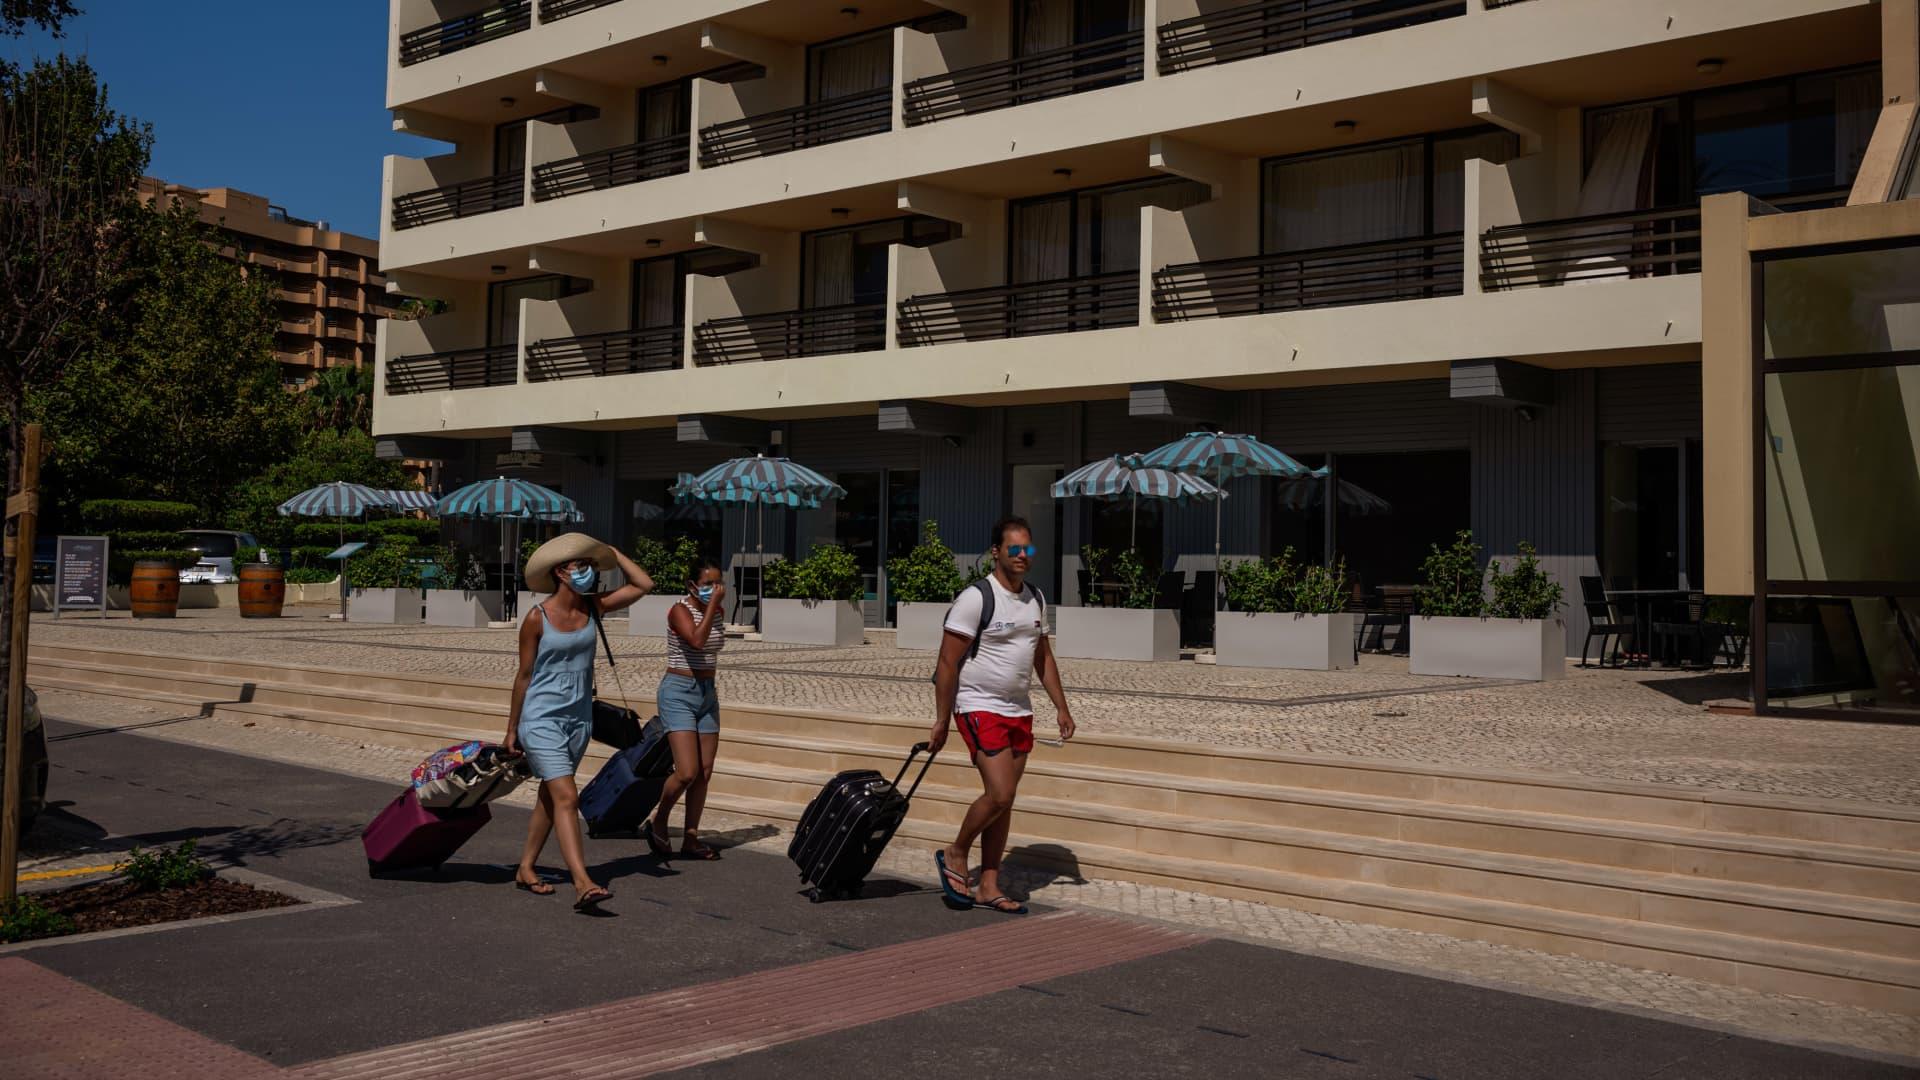 Tourists pull luggage as they walk towards a hotel at Villamoura beach in Villamoura, Algarve region, Portugal.